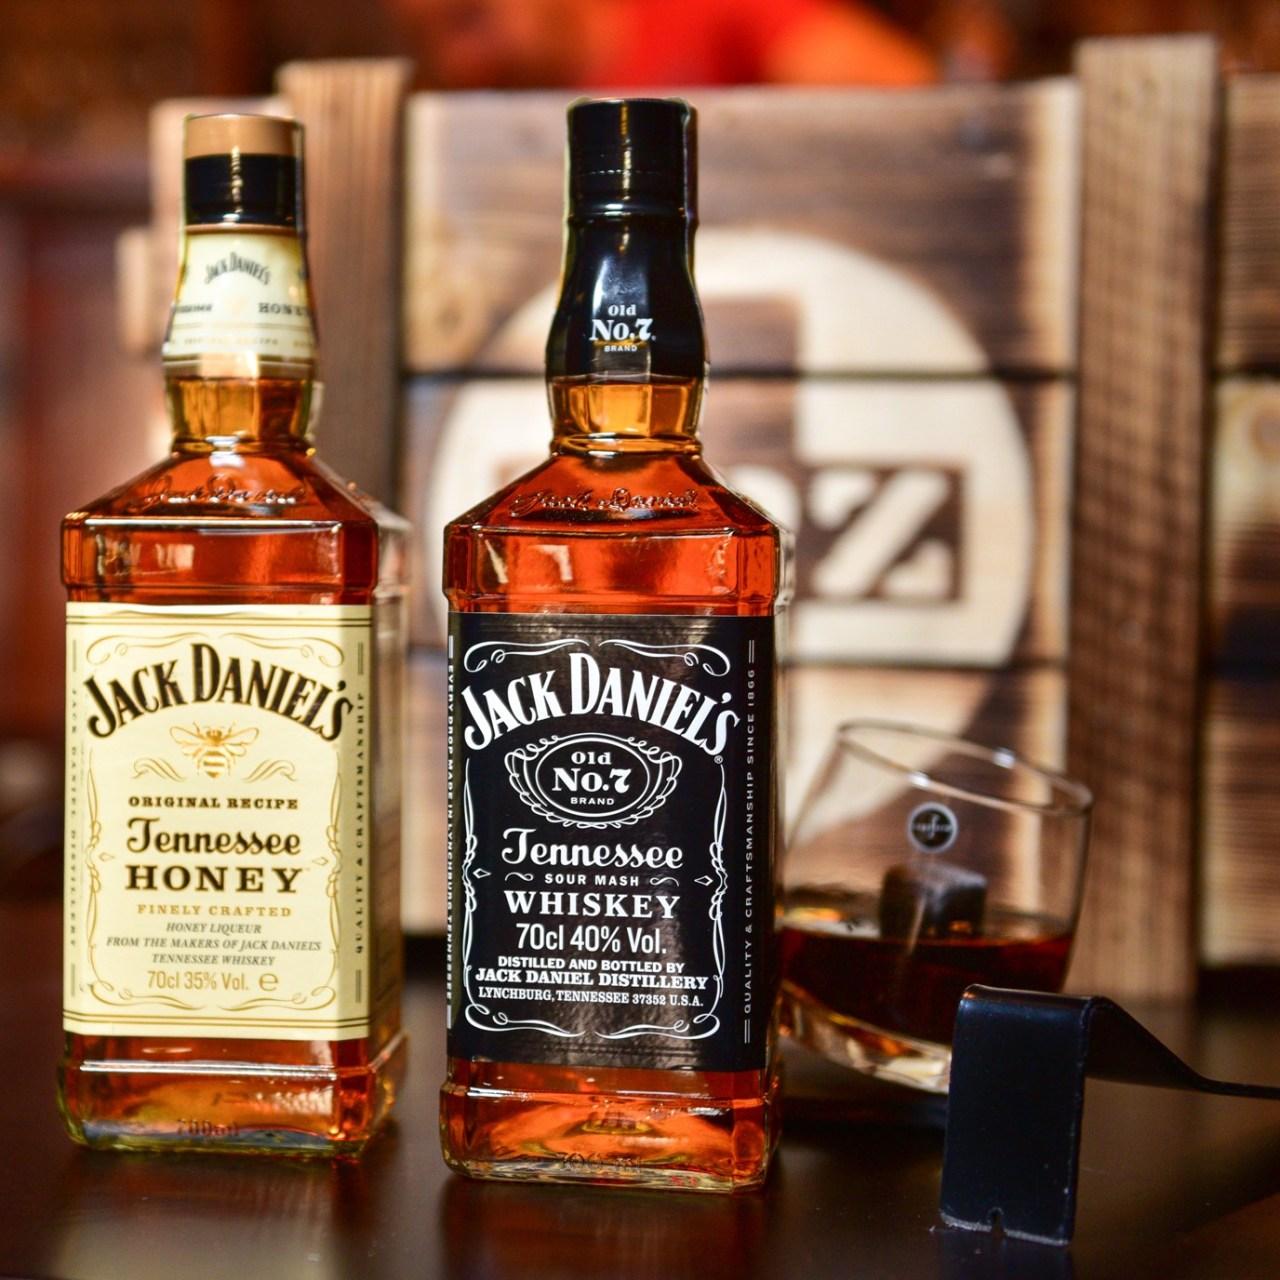 Jack Daniel's a Jack Daniel's Honey